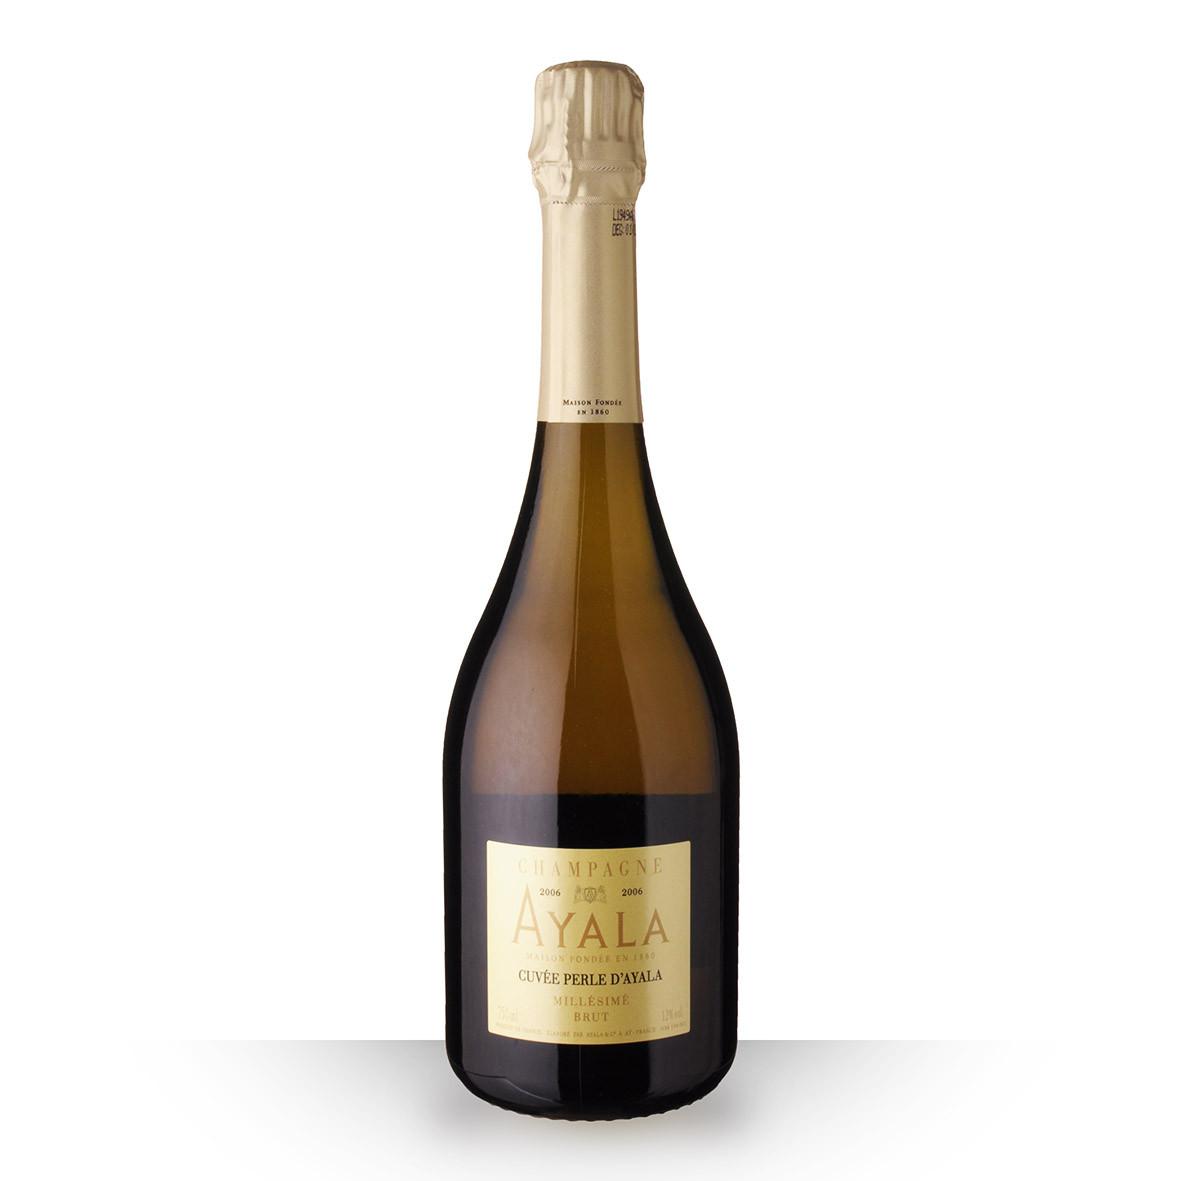 Champagne Ayala Perle dAyala 2006 Brut 75cl www.odyssee-vins.com